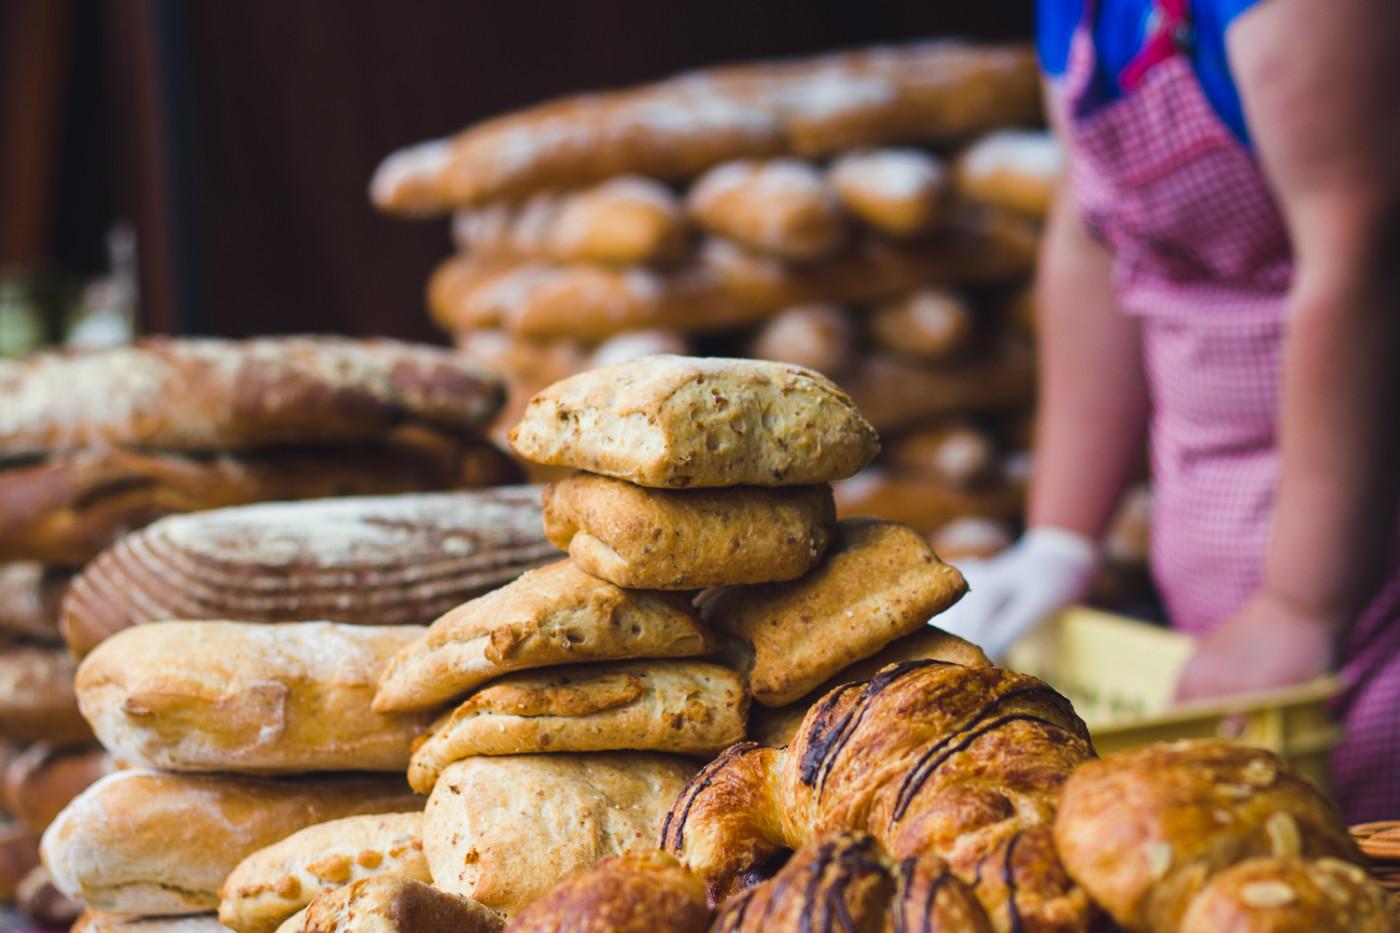 Prague Farmer's Market. Photo by Anthony Roderman via Flickr CC